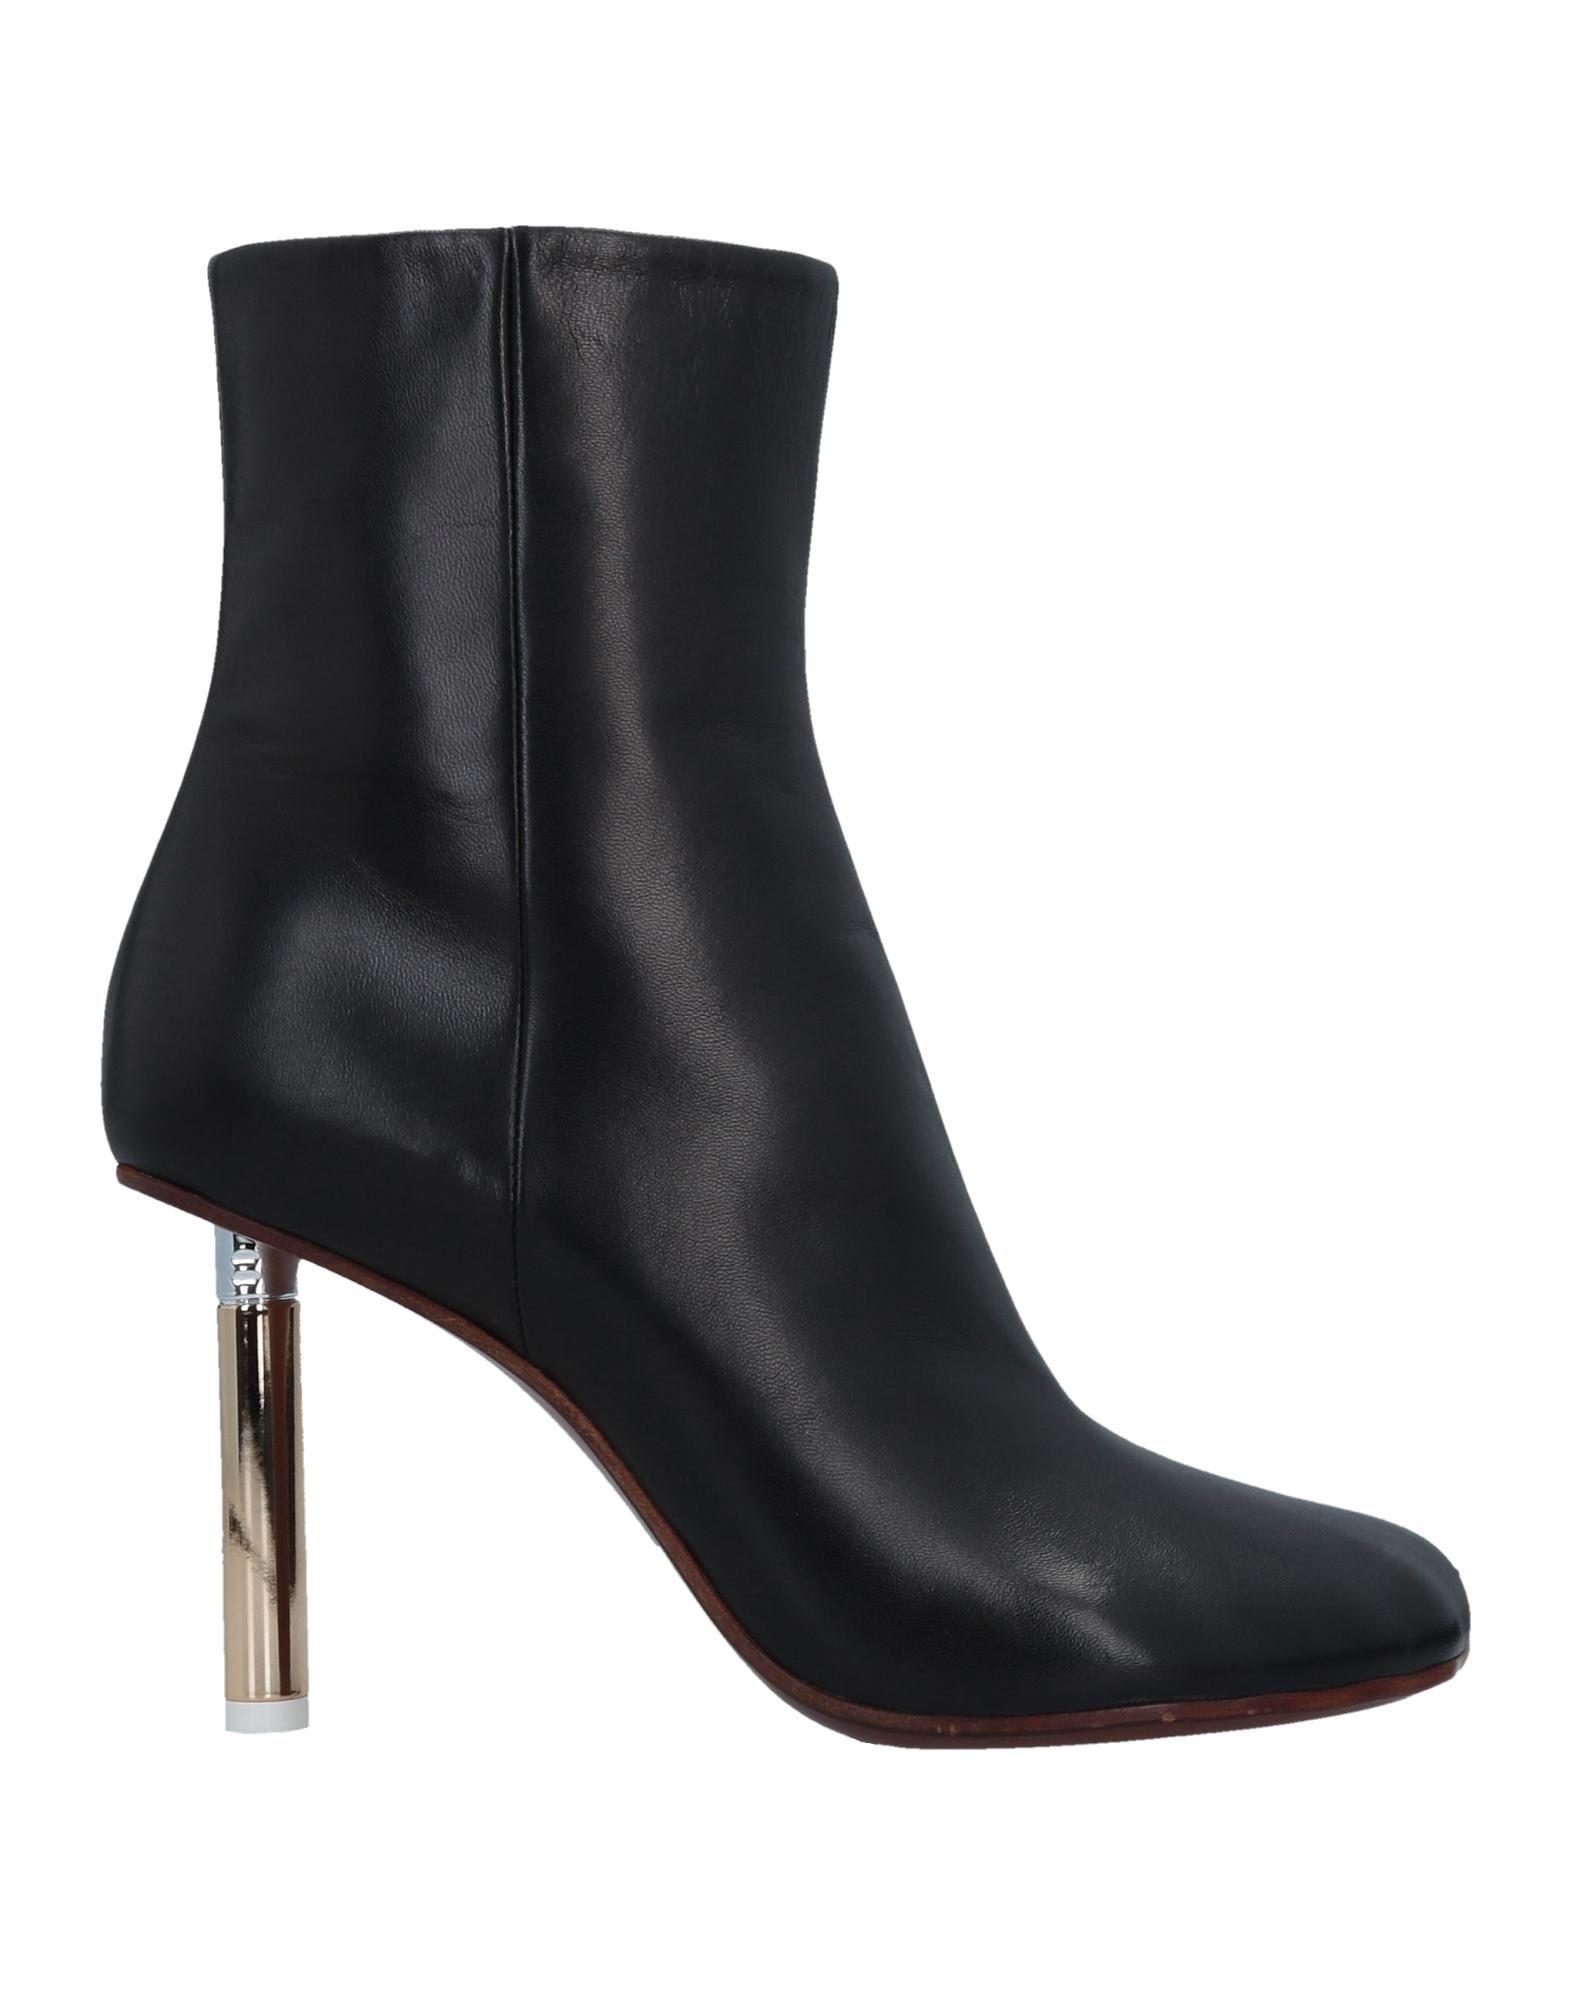 Vetements Ankle Boot - Women Vetements Ankle Australia Boots online on  Australia Ankle - 11509725CQ 534eed